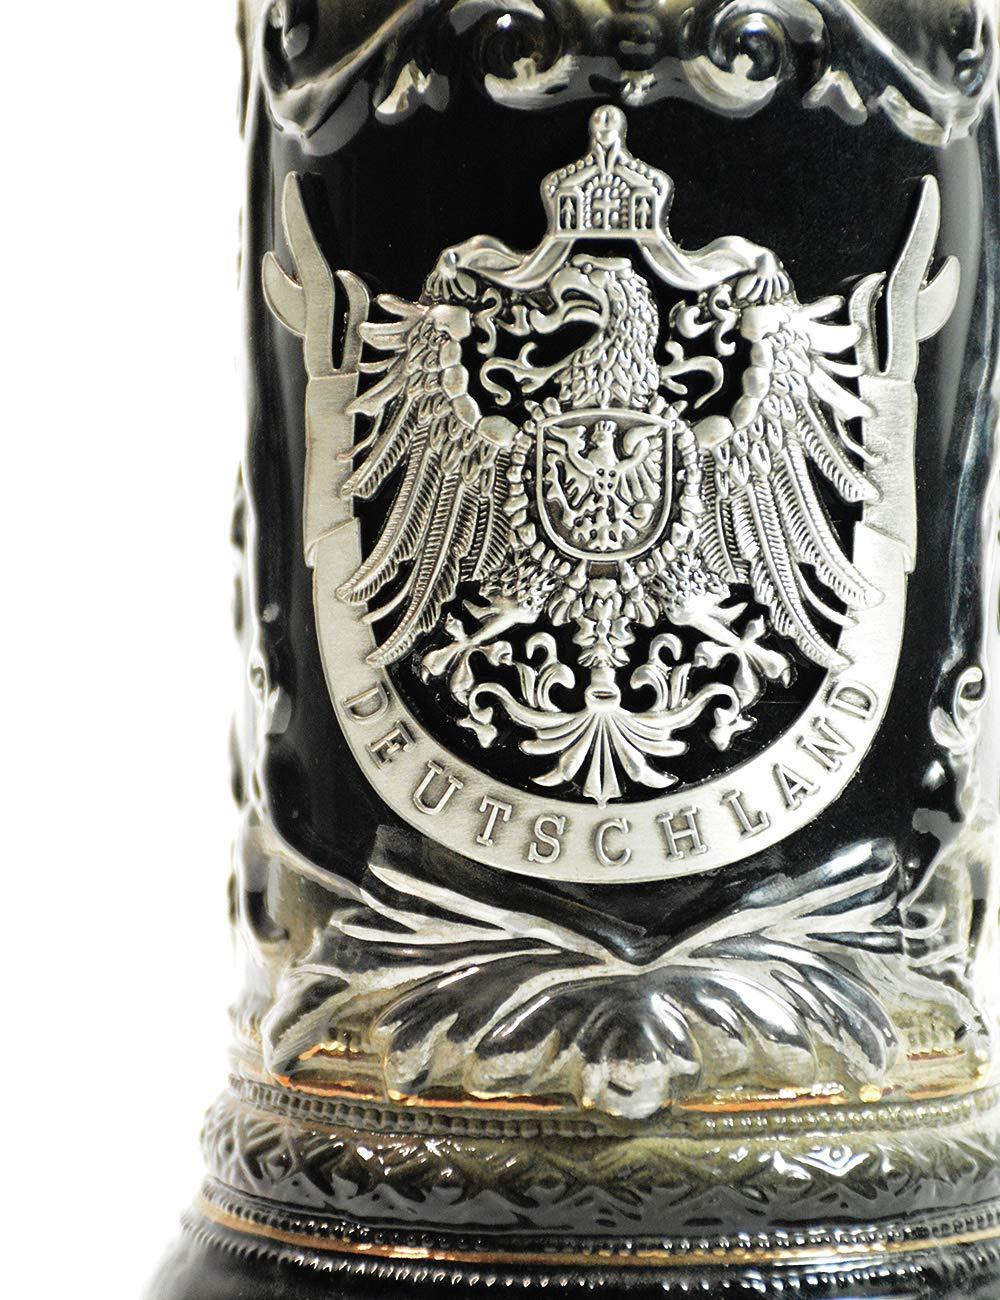 HomeBerry Beer Stein German Beer Stein With Lid Bierkrug Bier Stein Mug Krug Ceramic Beer Stein Steins 0.6L by HomeBerry (Image #7)